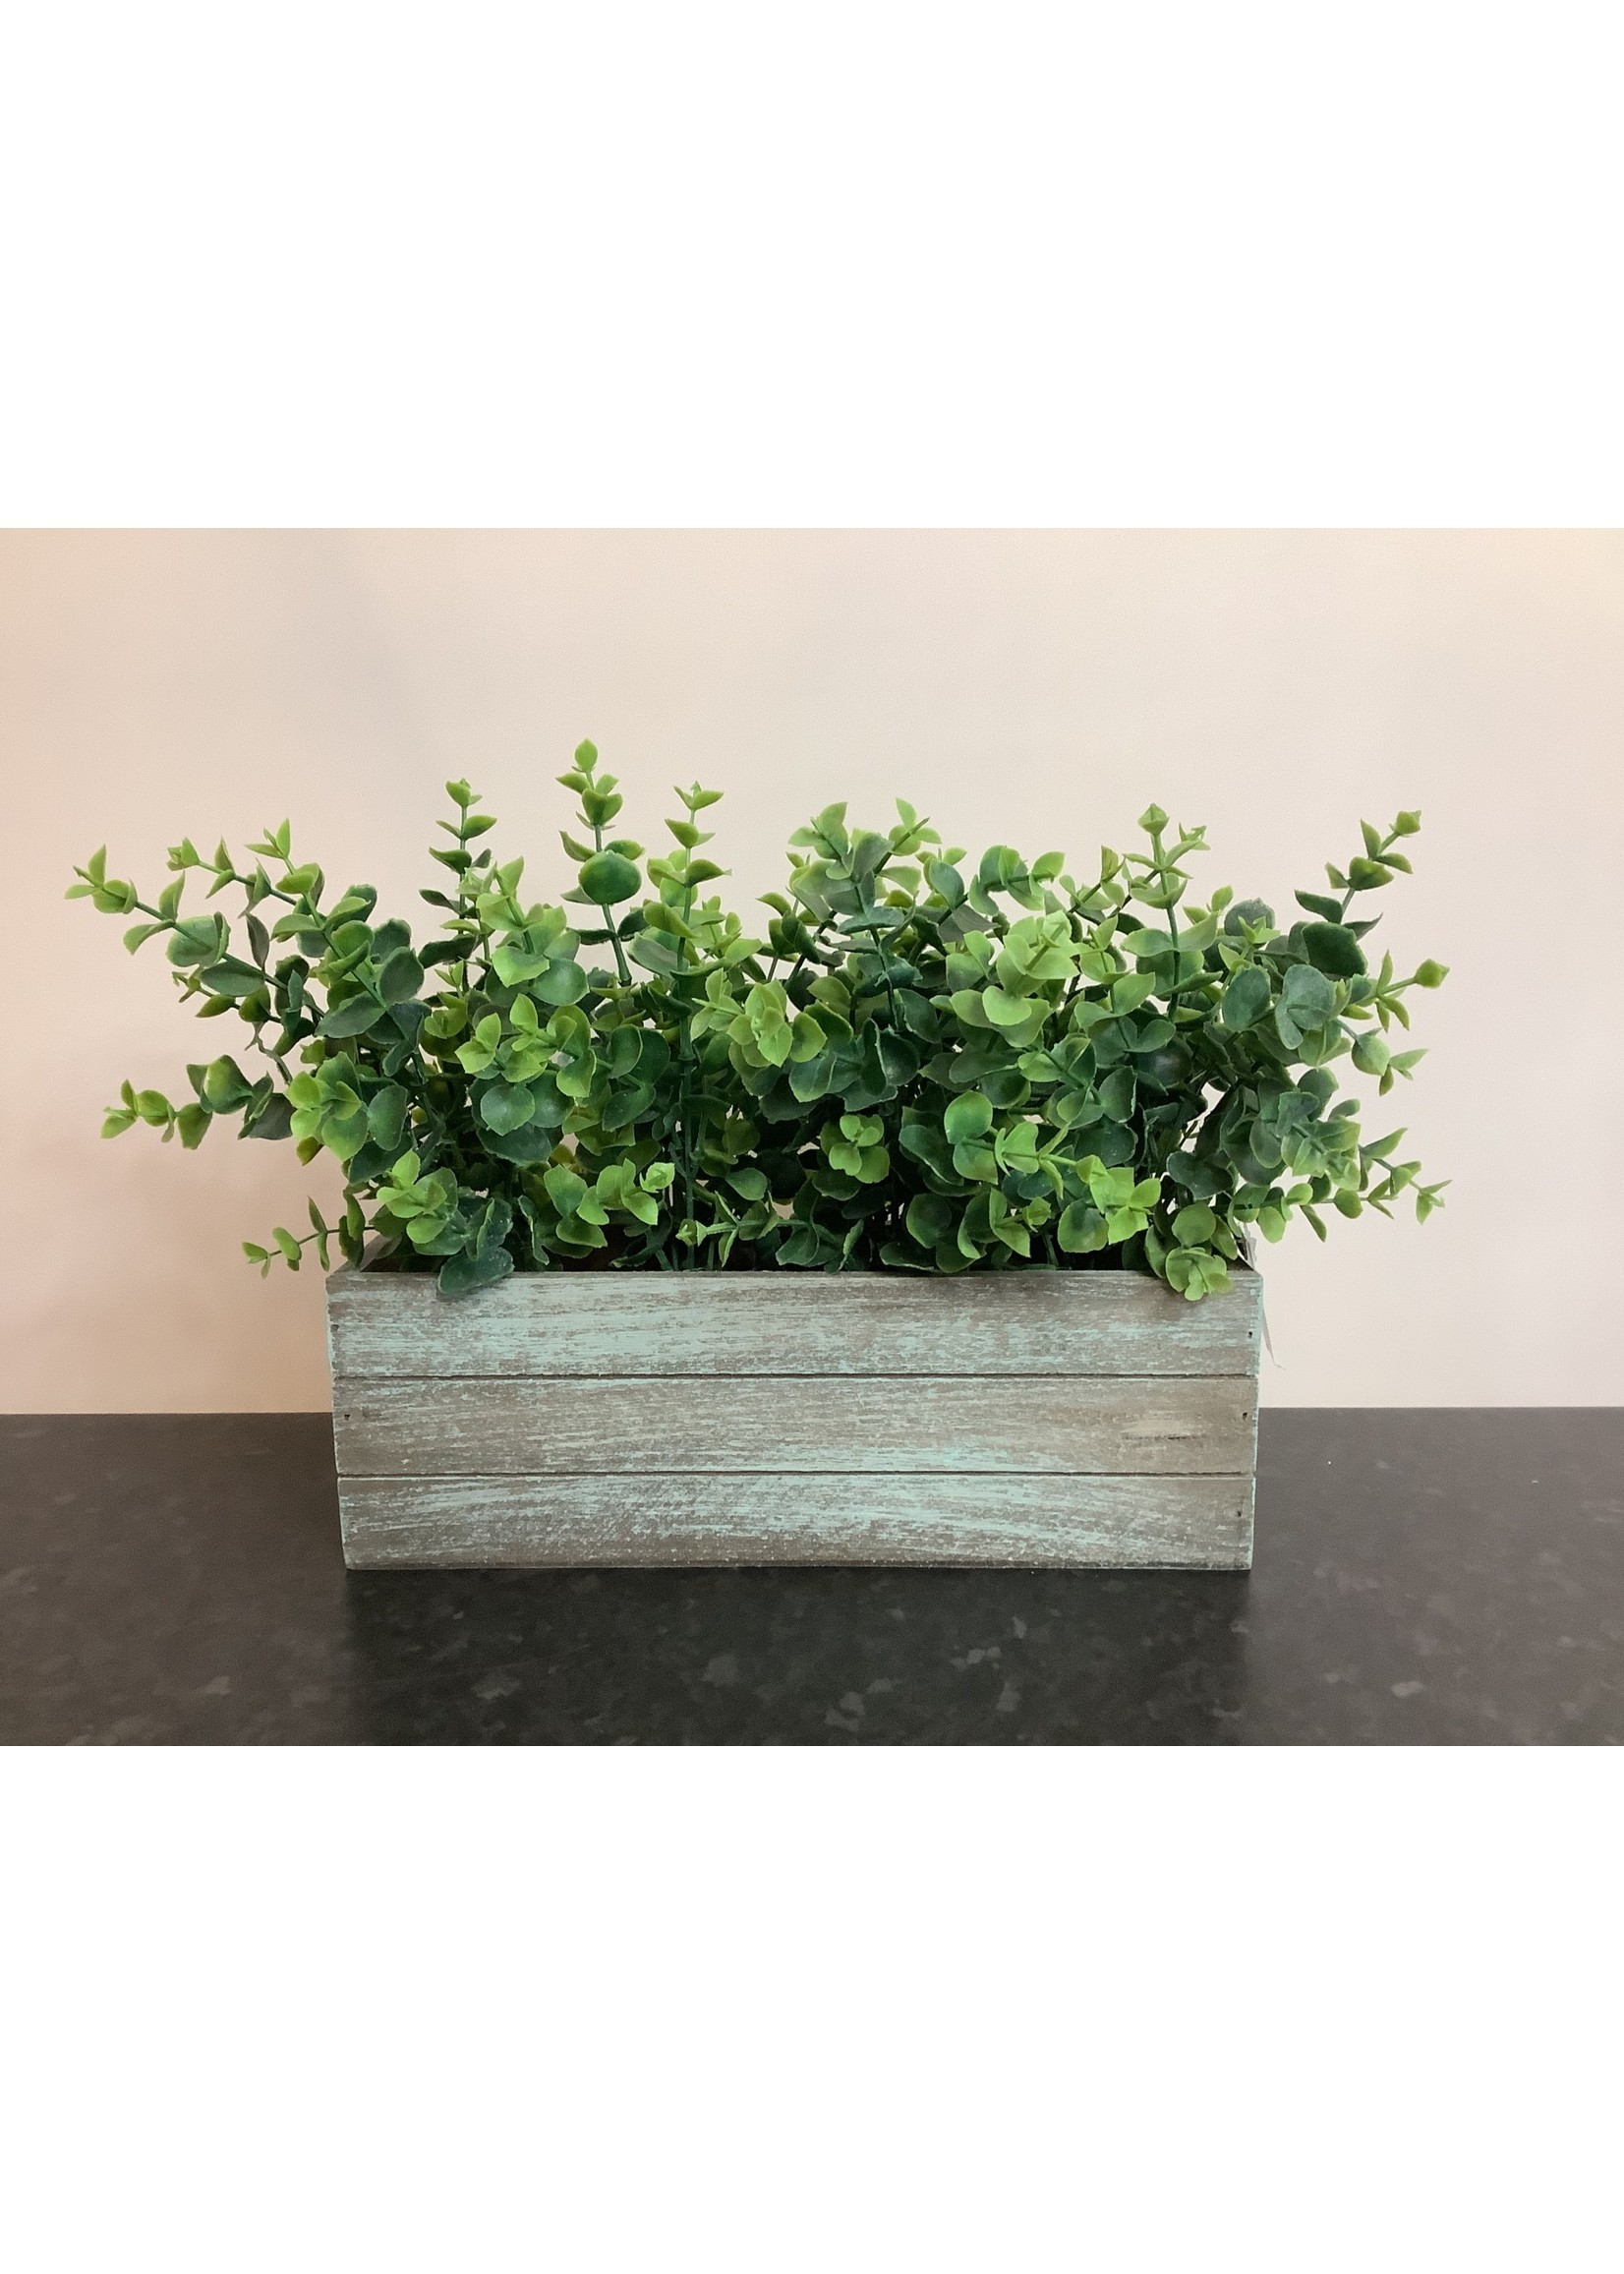 Eucalyptus in wooden box 30x25cm